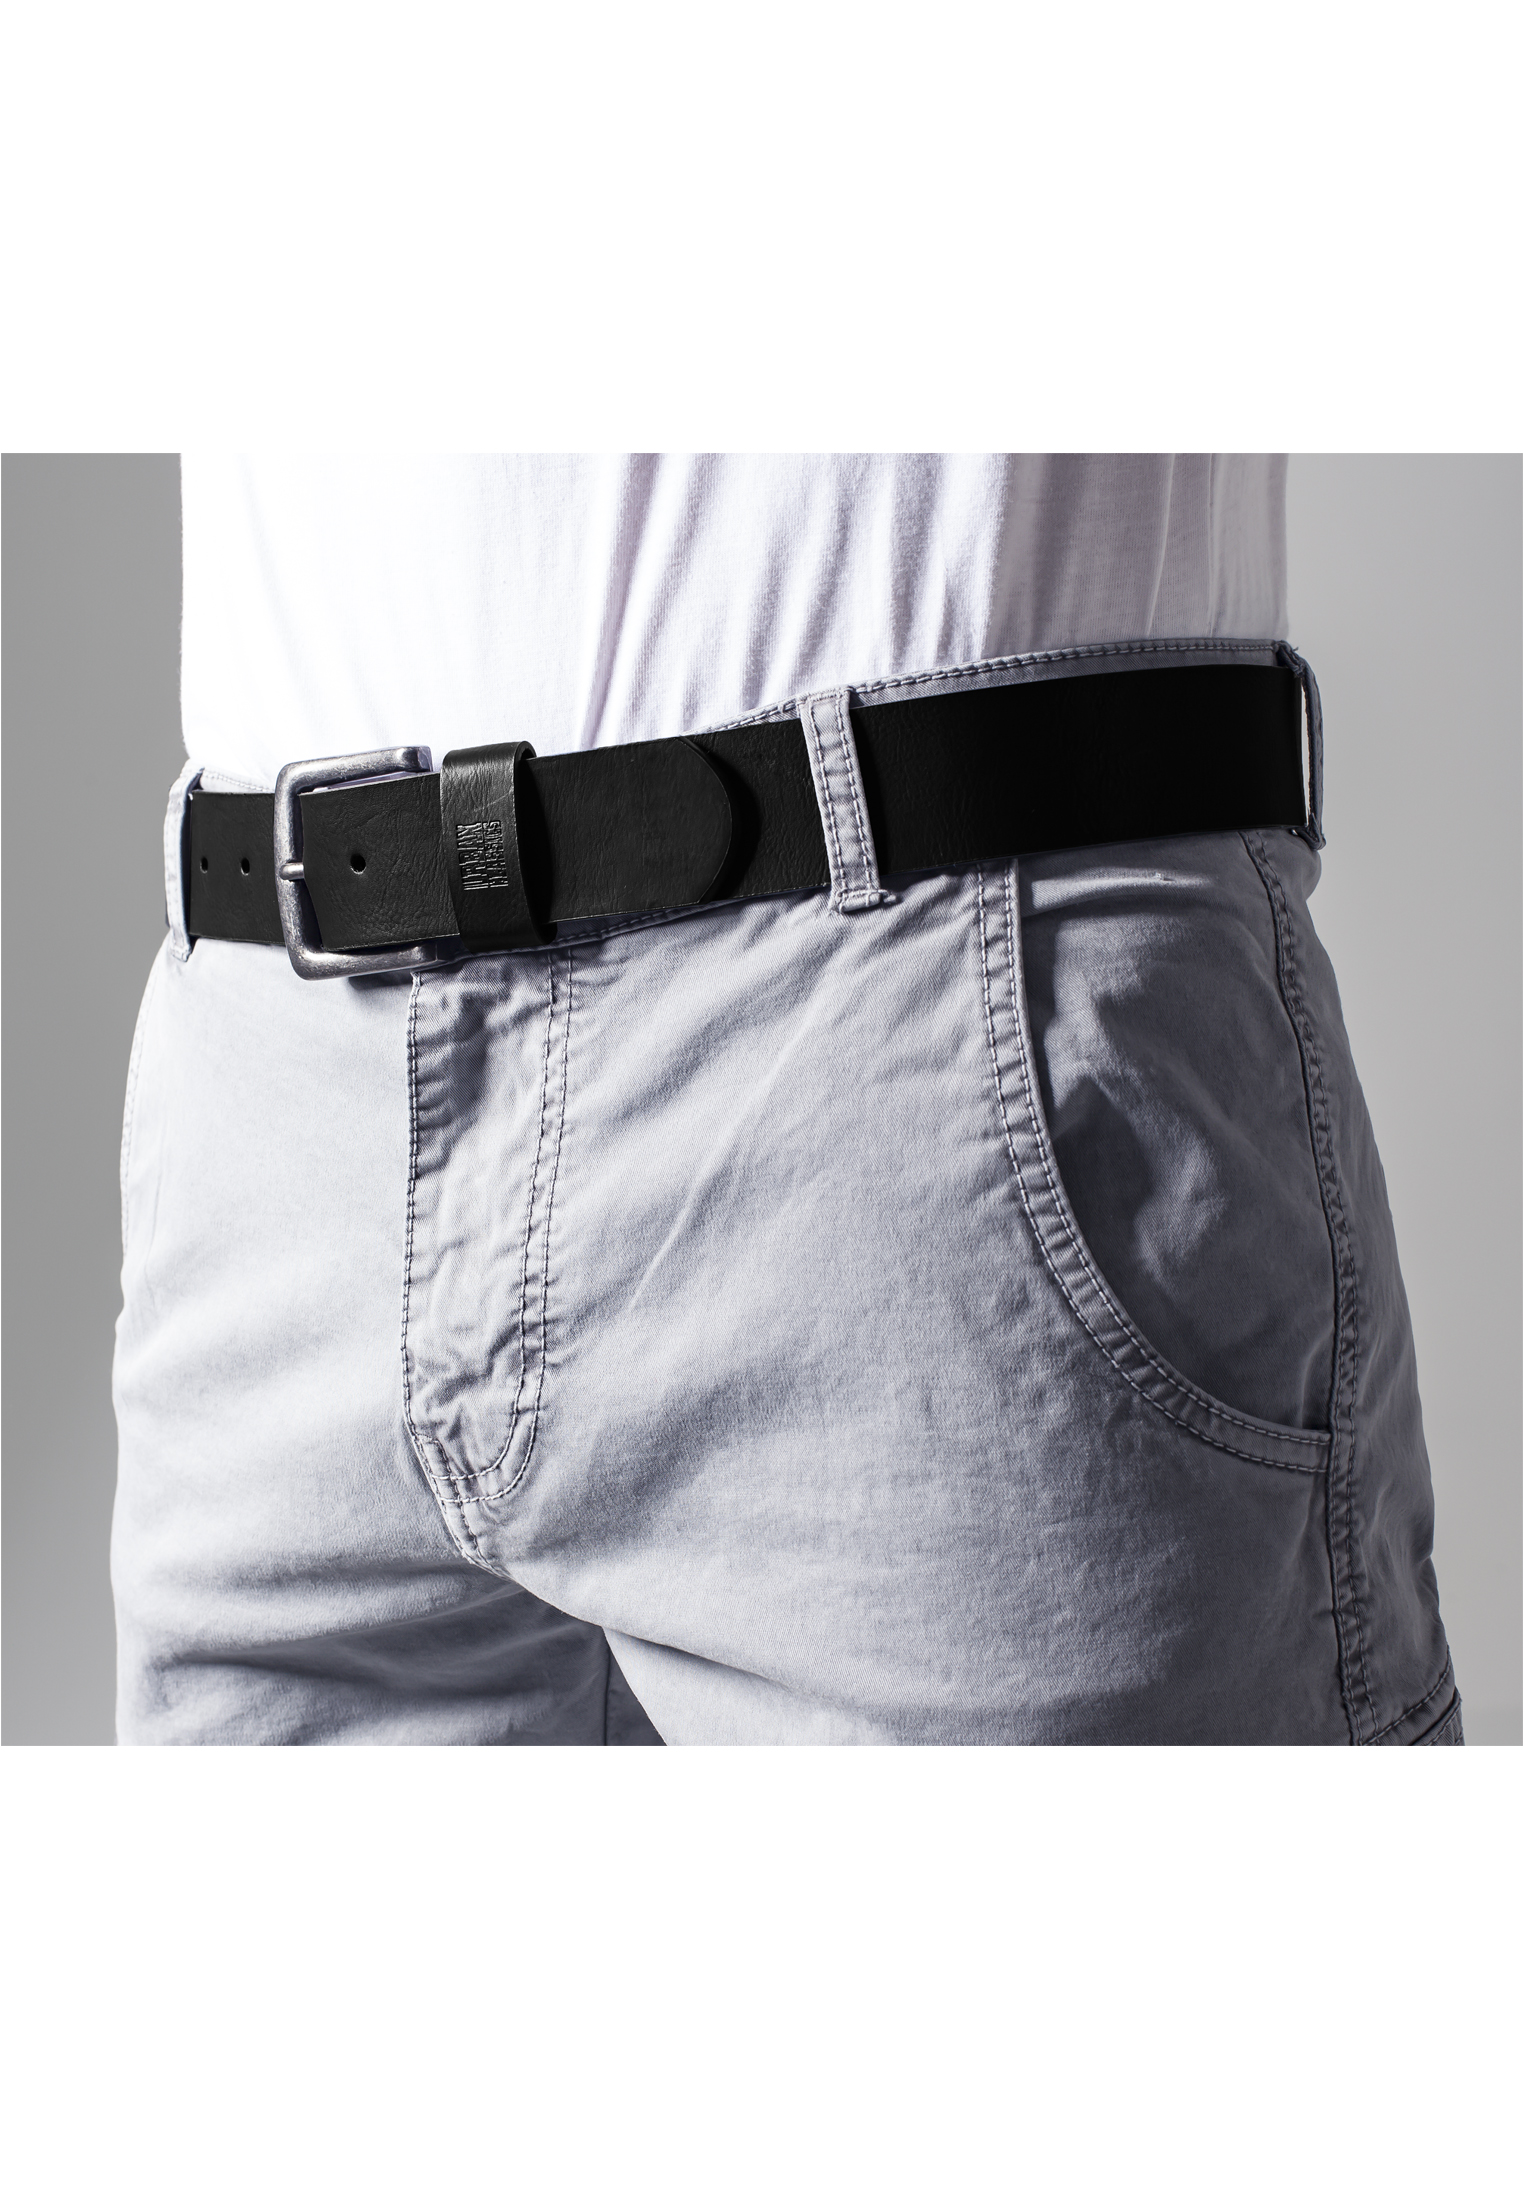 Urban-Classics-Herren-Guertel-casual-Leather-Imitation-Belt Indexbild 3